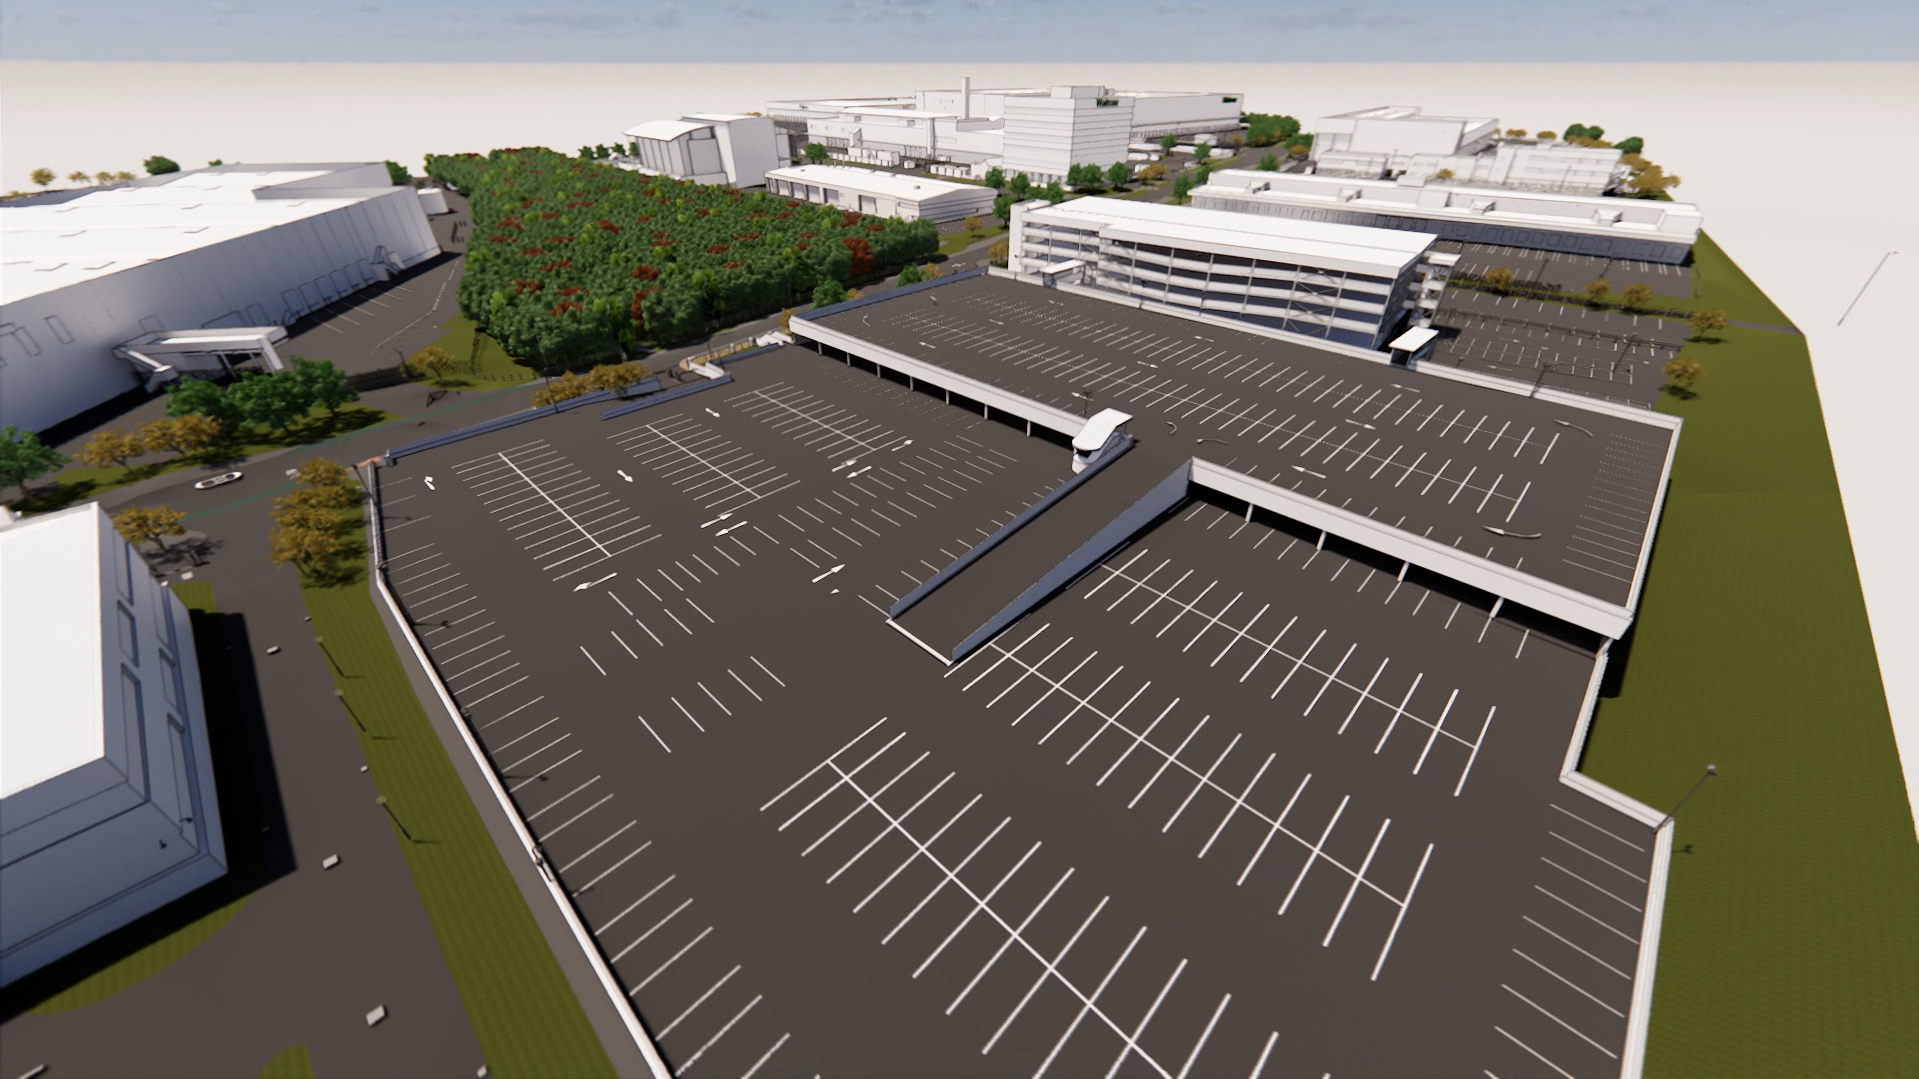 Waitrose Campus Bracknell parking lot